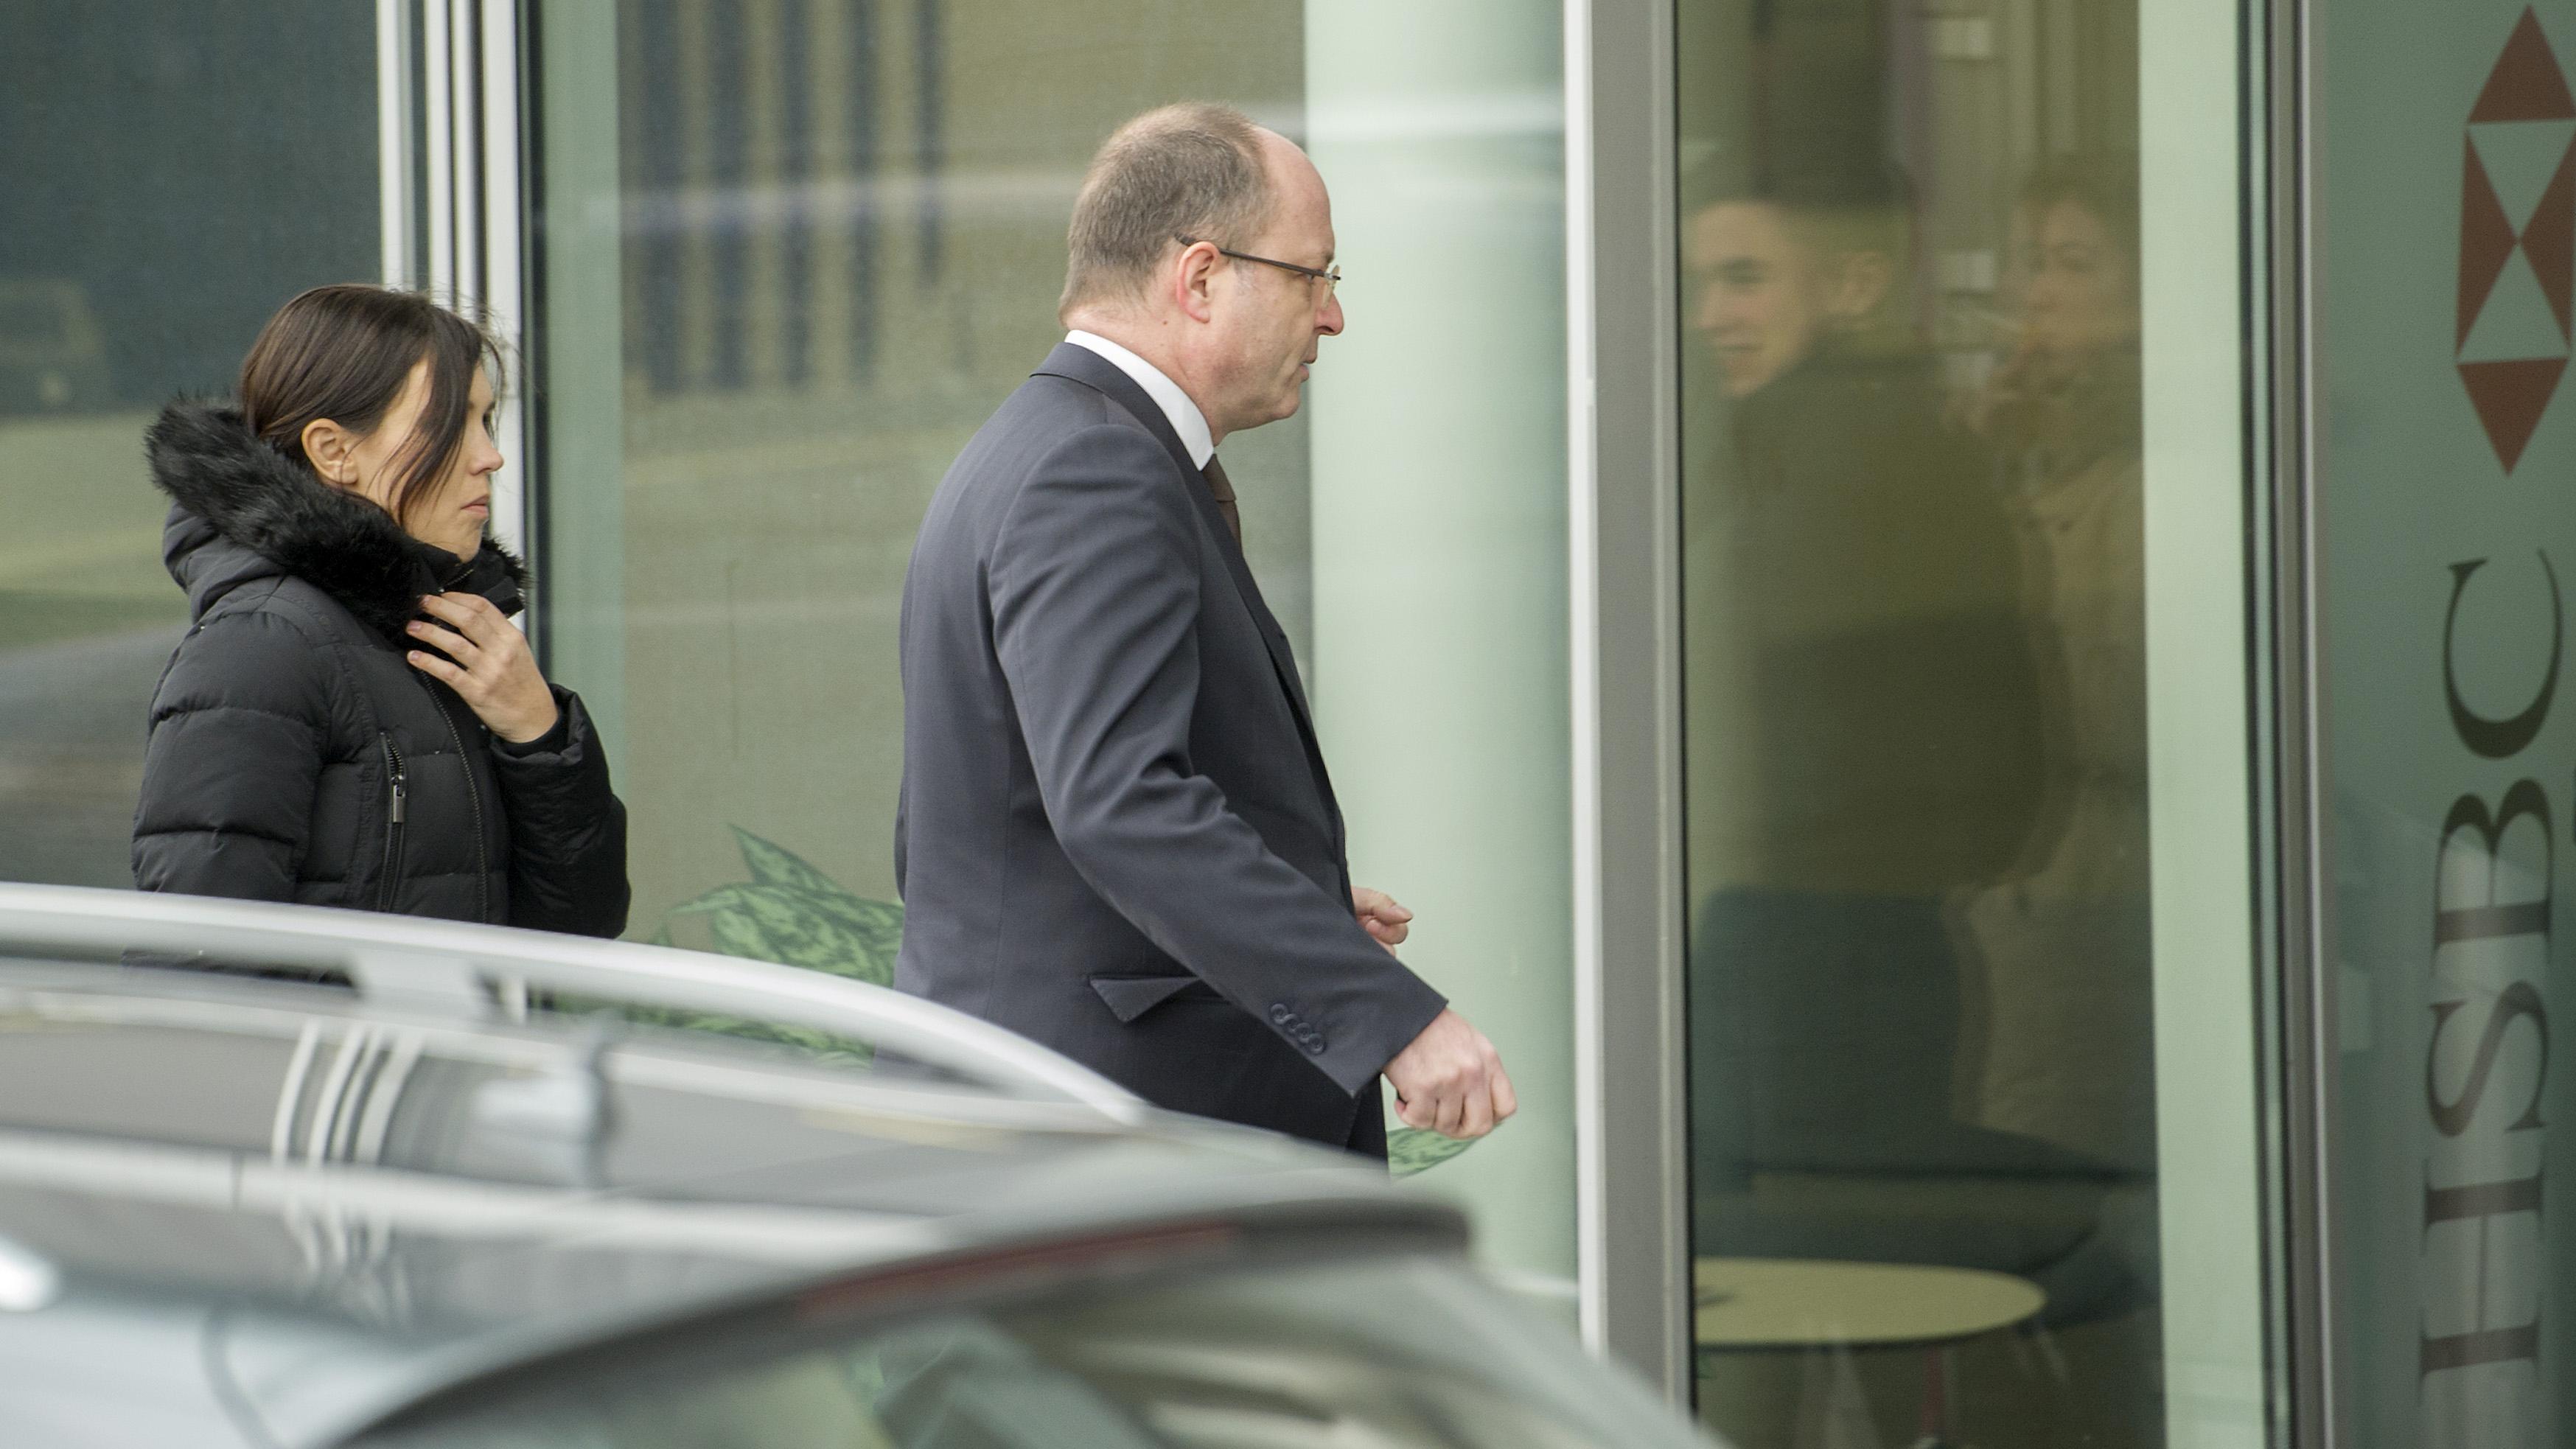 Prosecutors Raid HSBC's Geneva Office Over Suspected Money Laundering